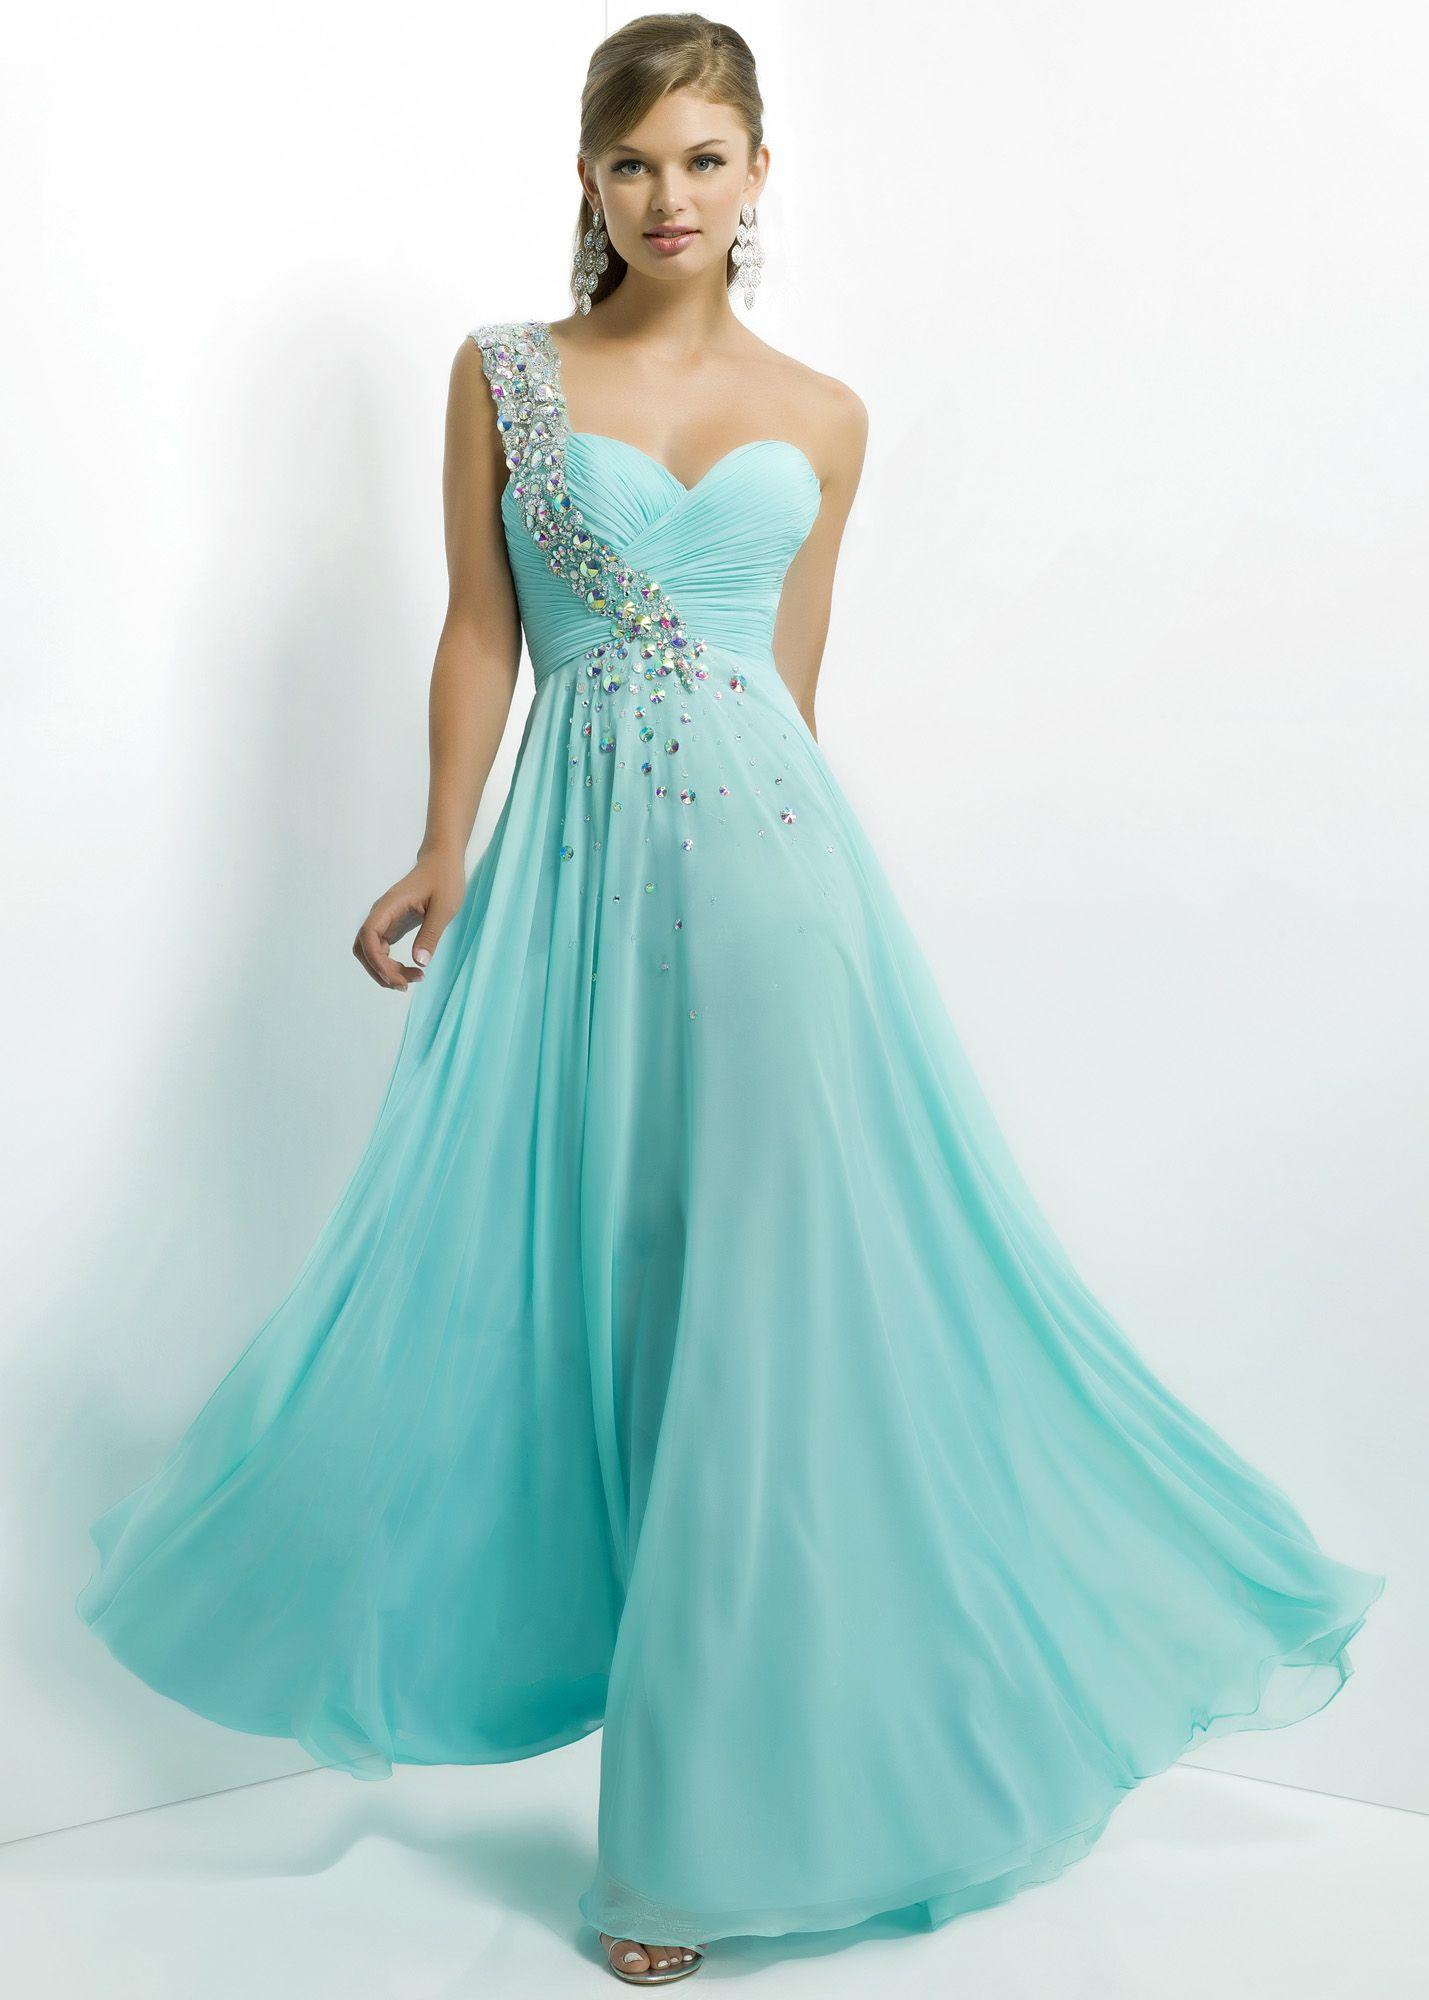 Indigo gown | Indigo Homecoming Dresses by La Femme 17902 [La Femme ...